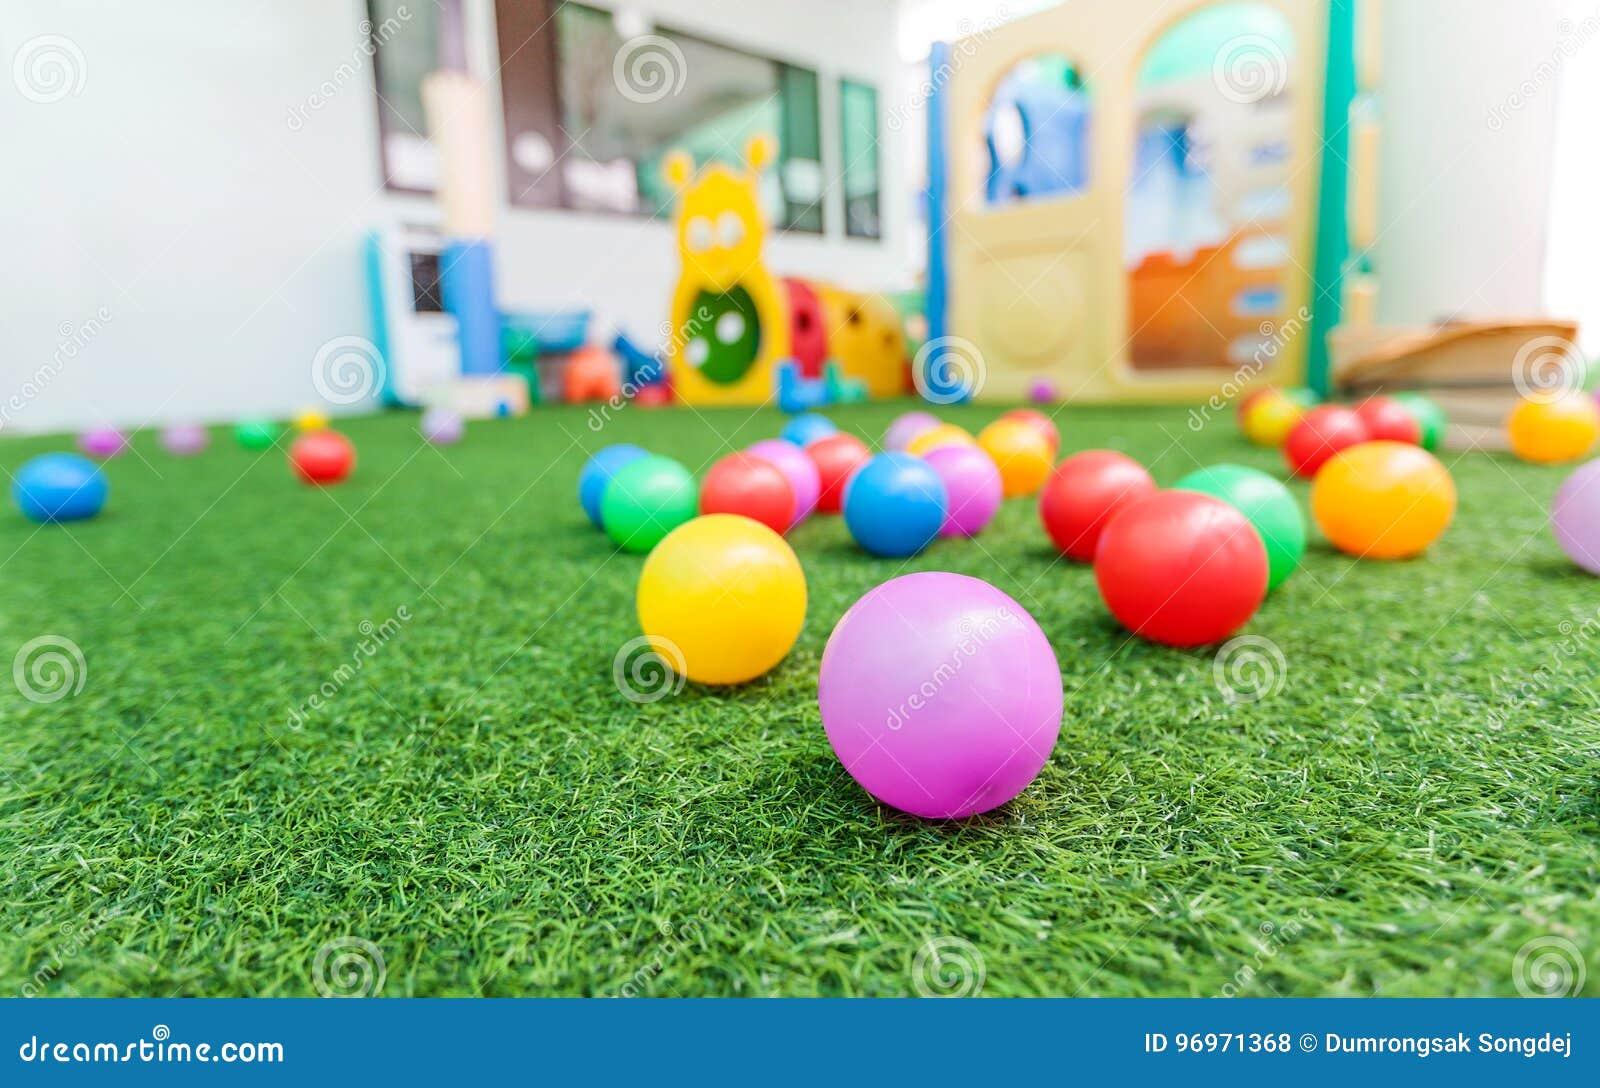 96a7eb518a4 Ζωηρόχρωμη πλαστική σφαίρα στην πράσινη τύρφη στη σχολική παιδική ...